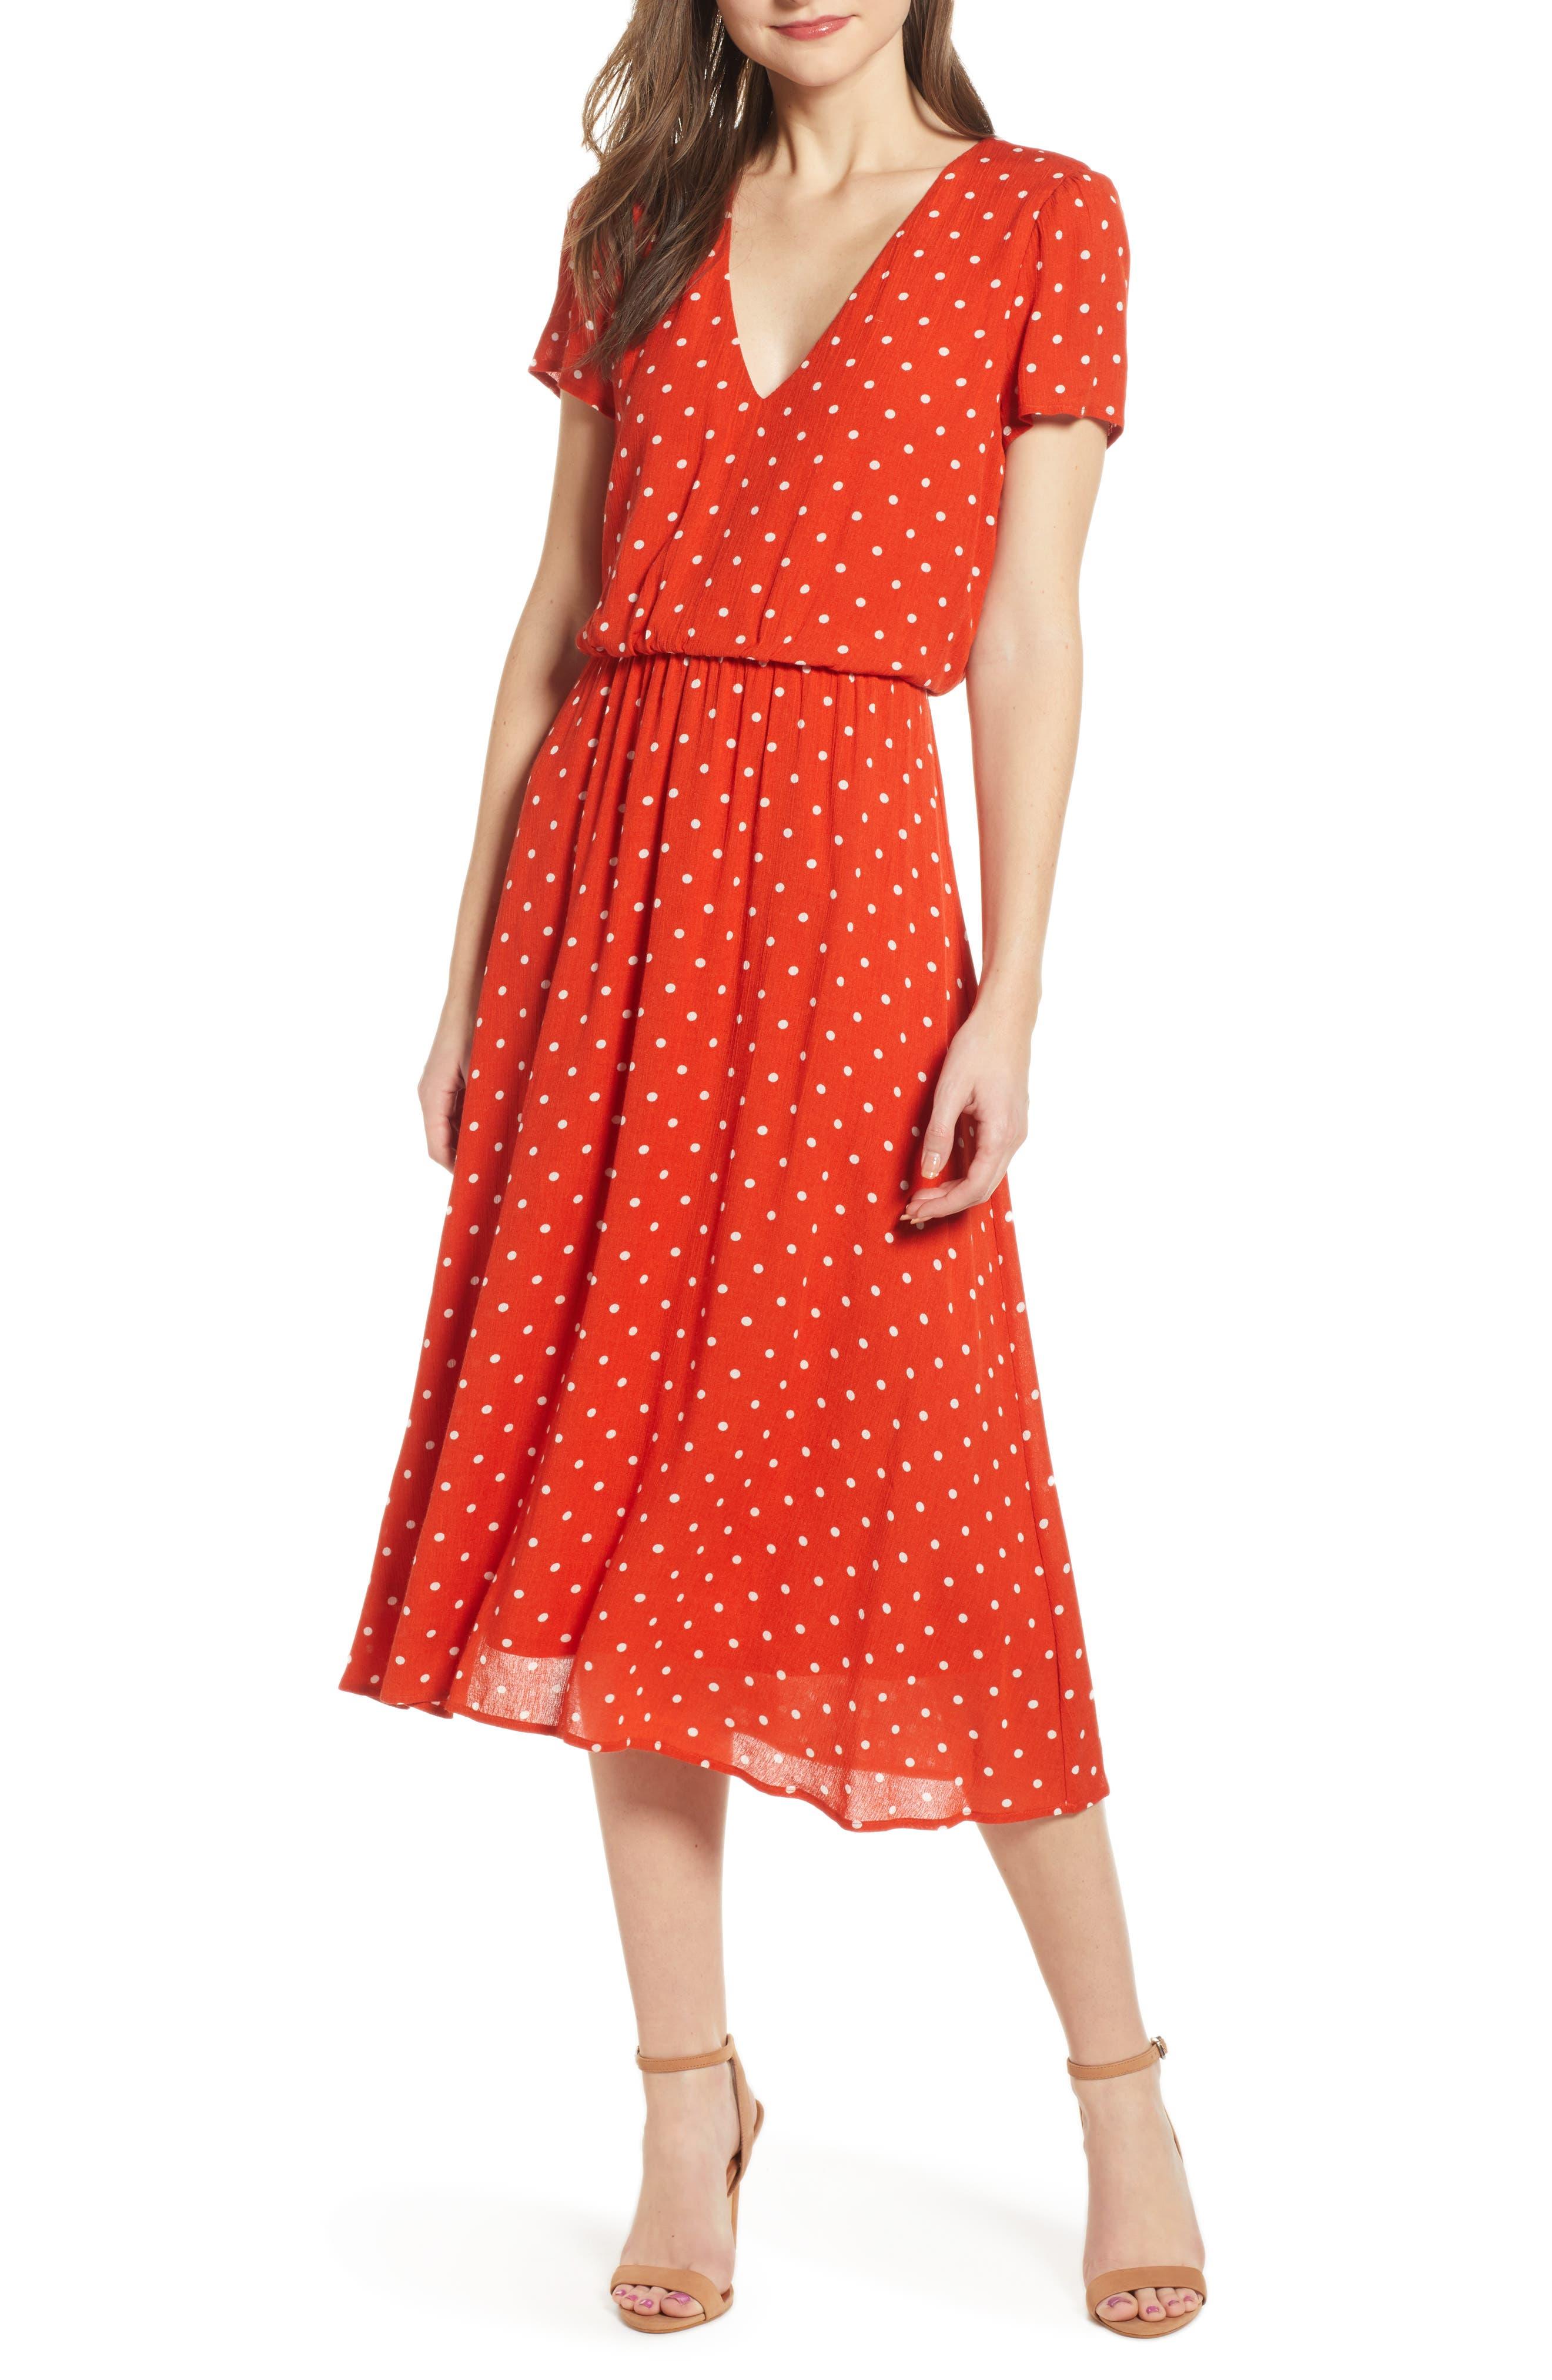 Wayf Blouson Midi Dress, Orange